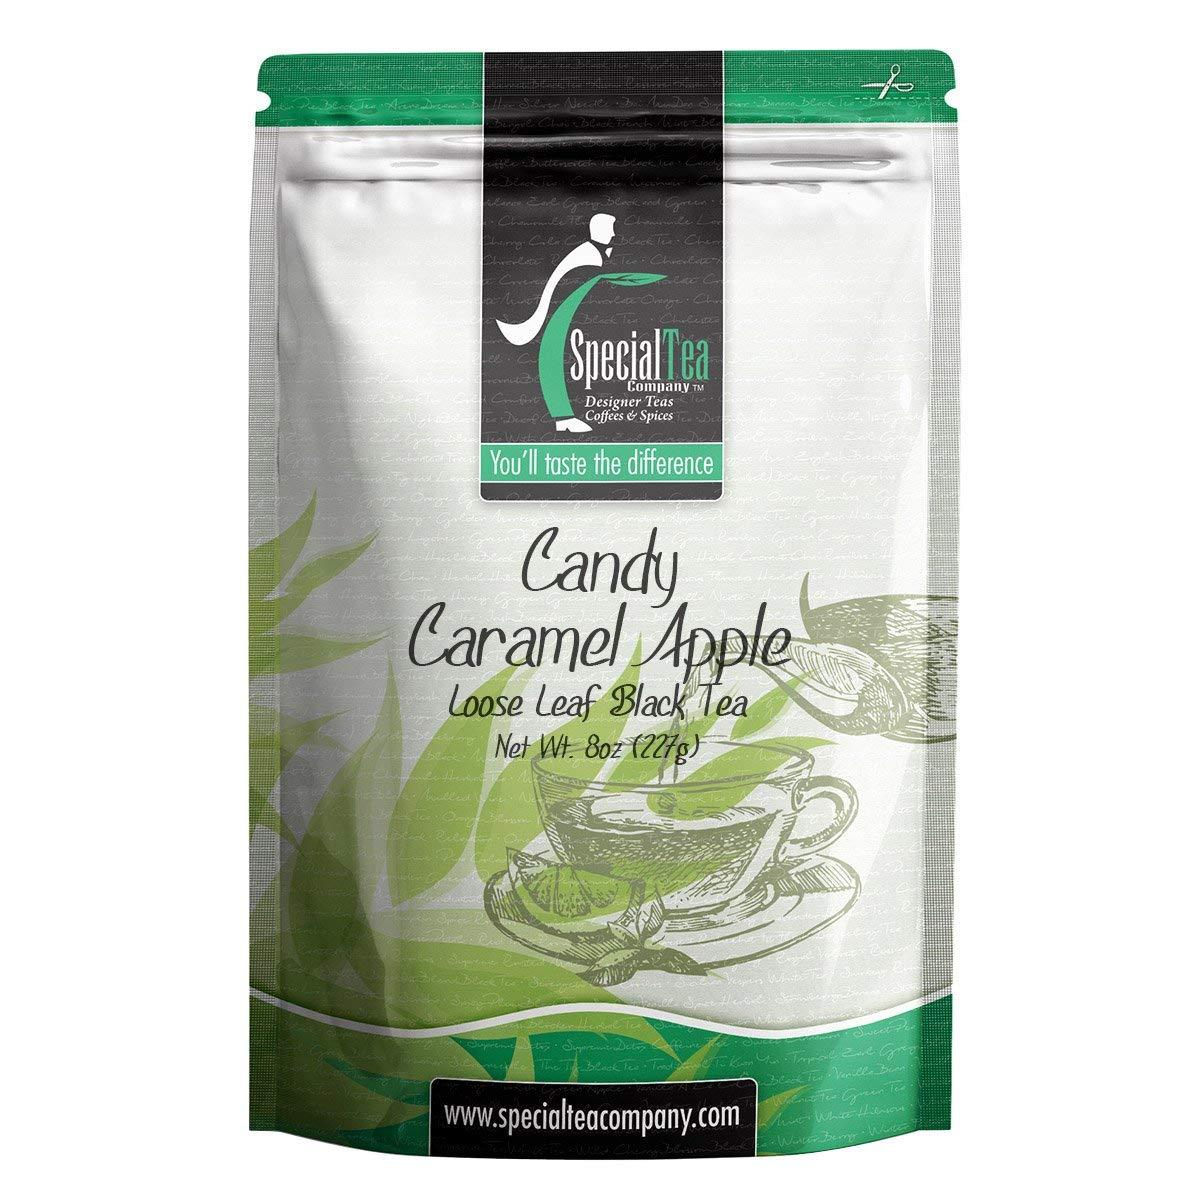 Special Tea Company Candy Caramel Apple Loose Leaf Black Tea, 8 oz.